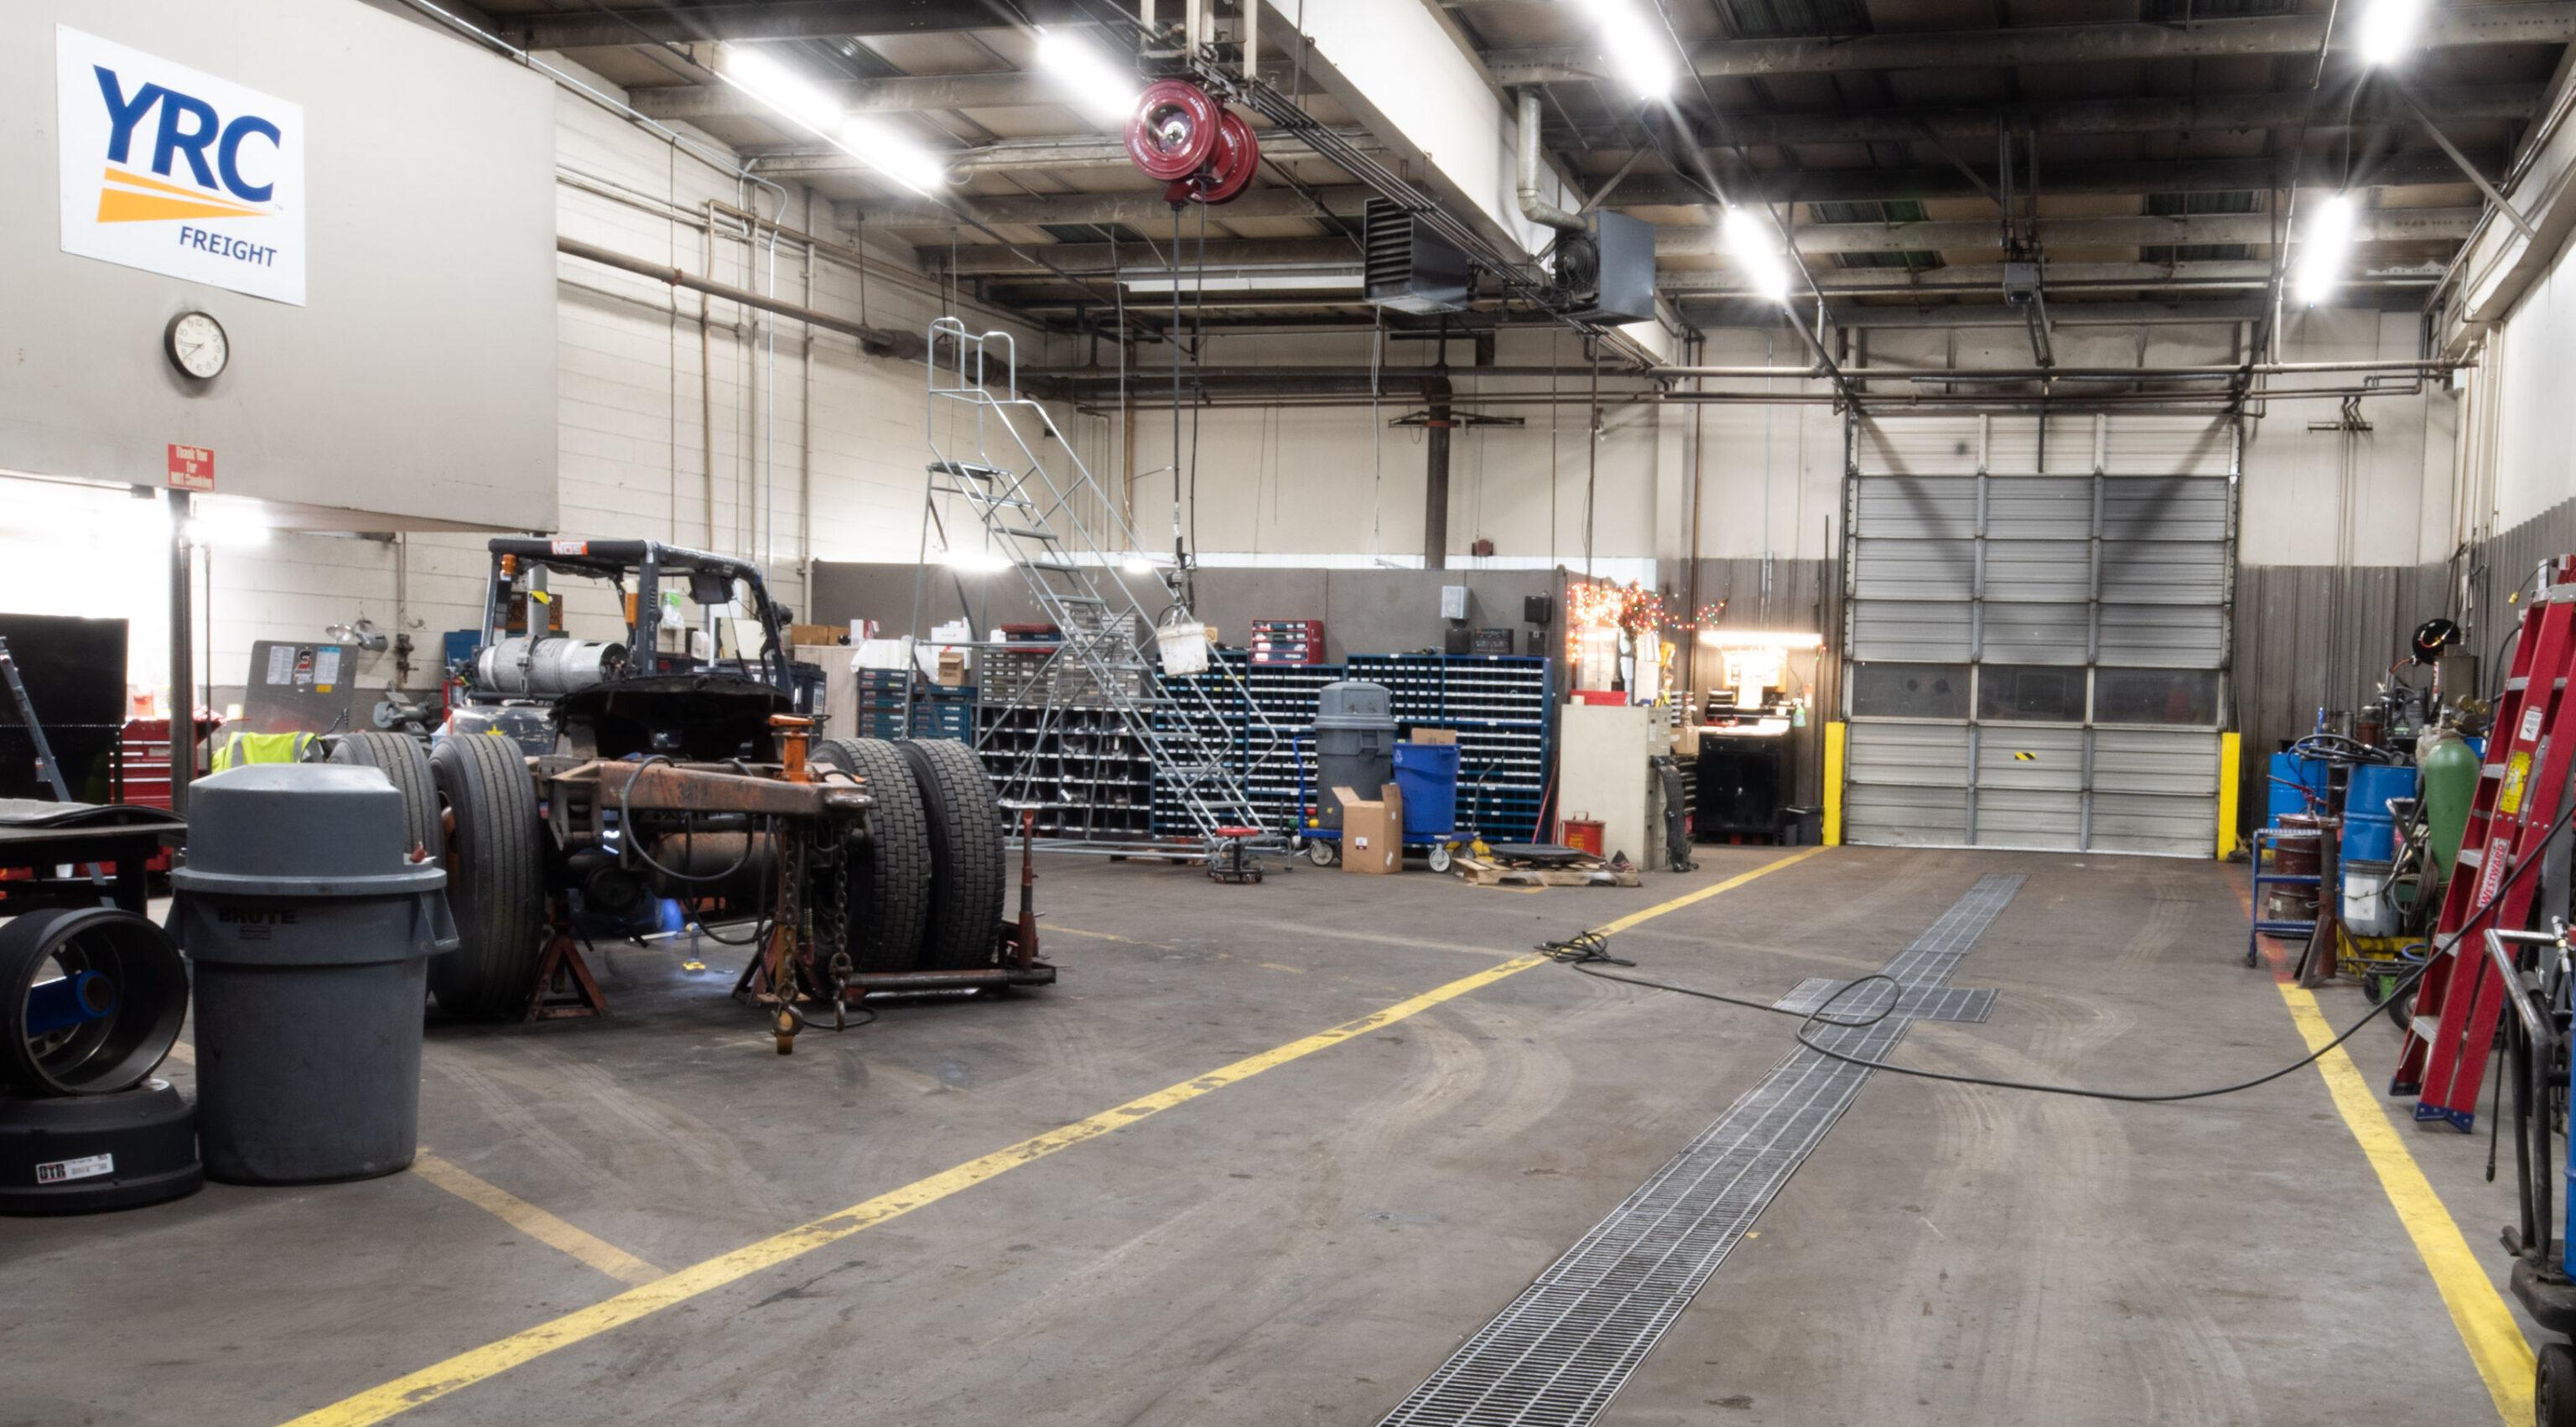 LED Light upgrade for YRC Freight